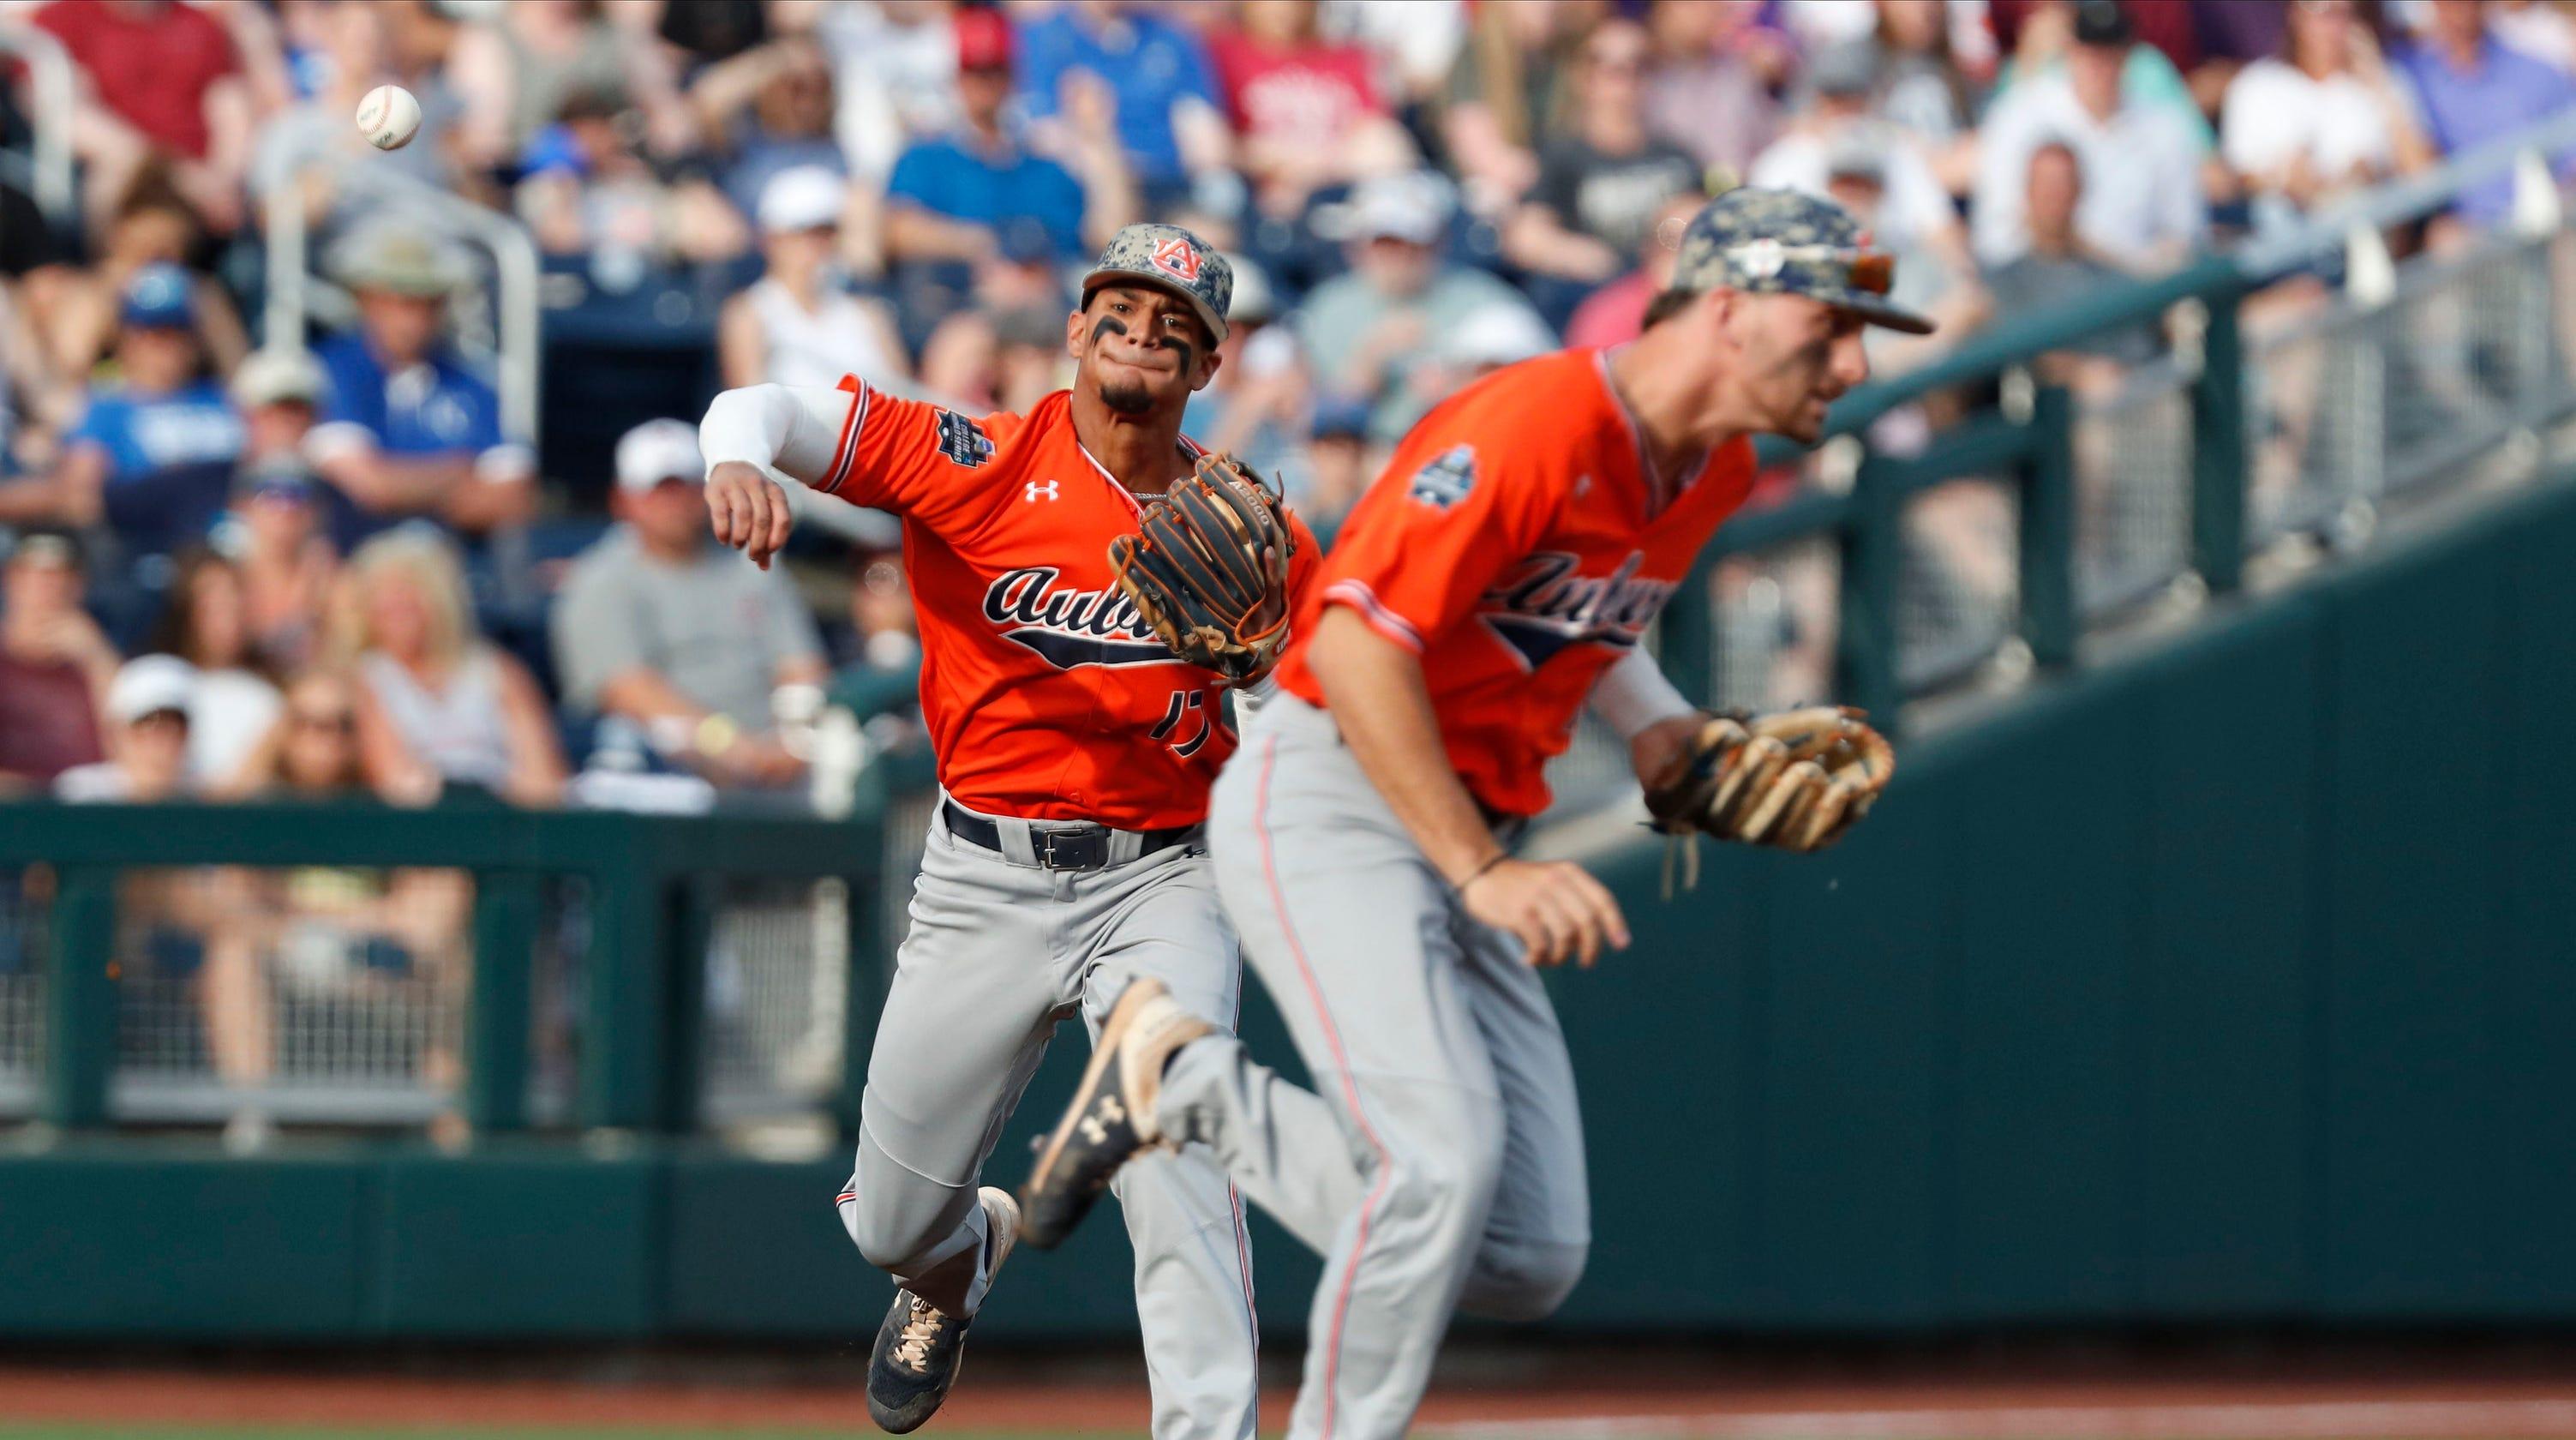 College World Series 2019: Auburn vs. Mississippi State baseball video highlights, score